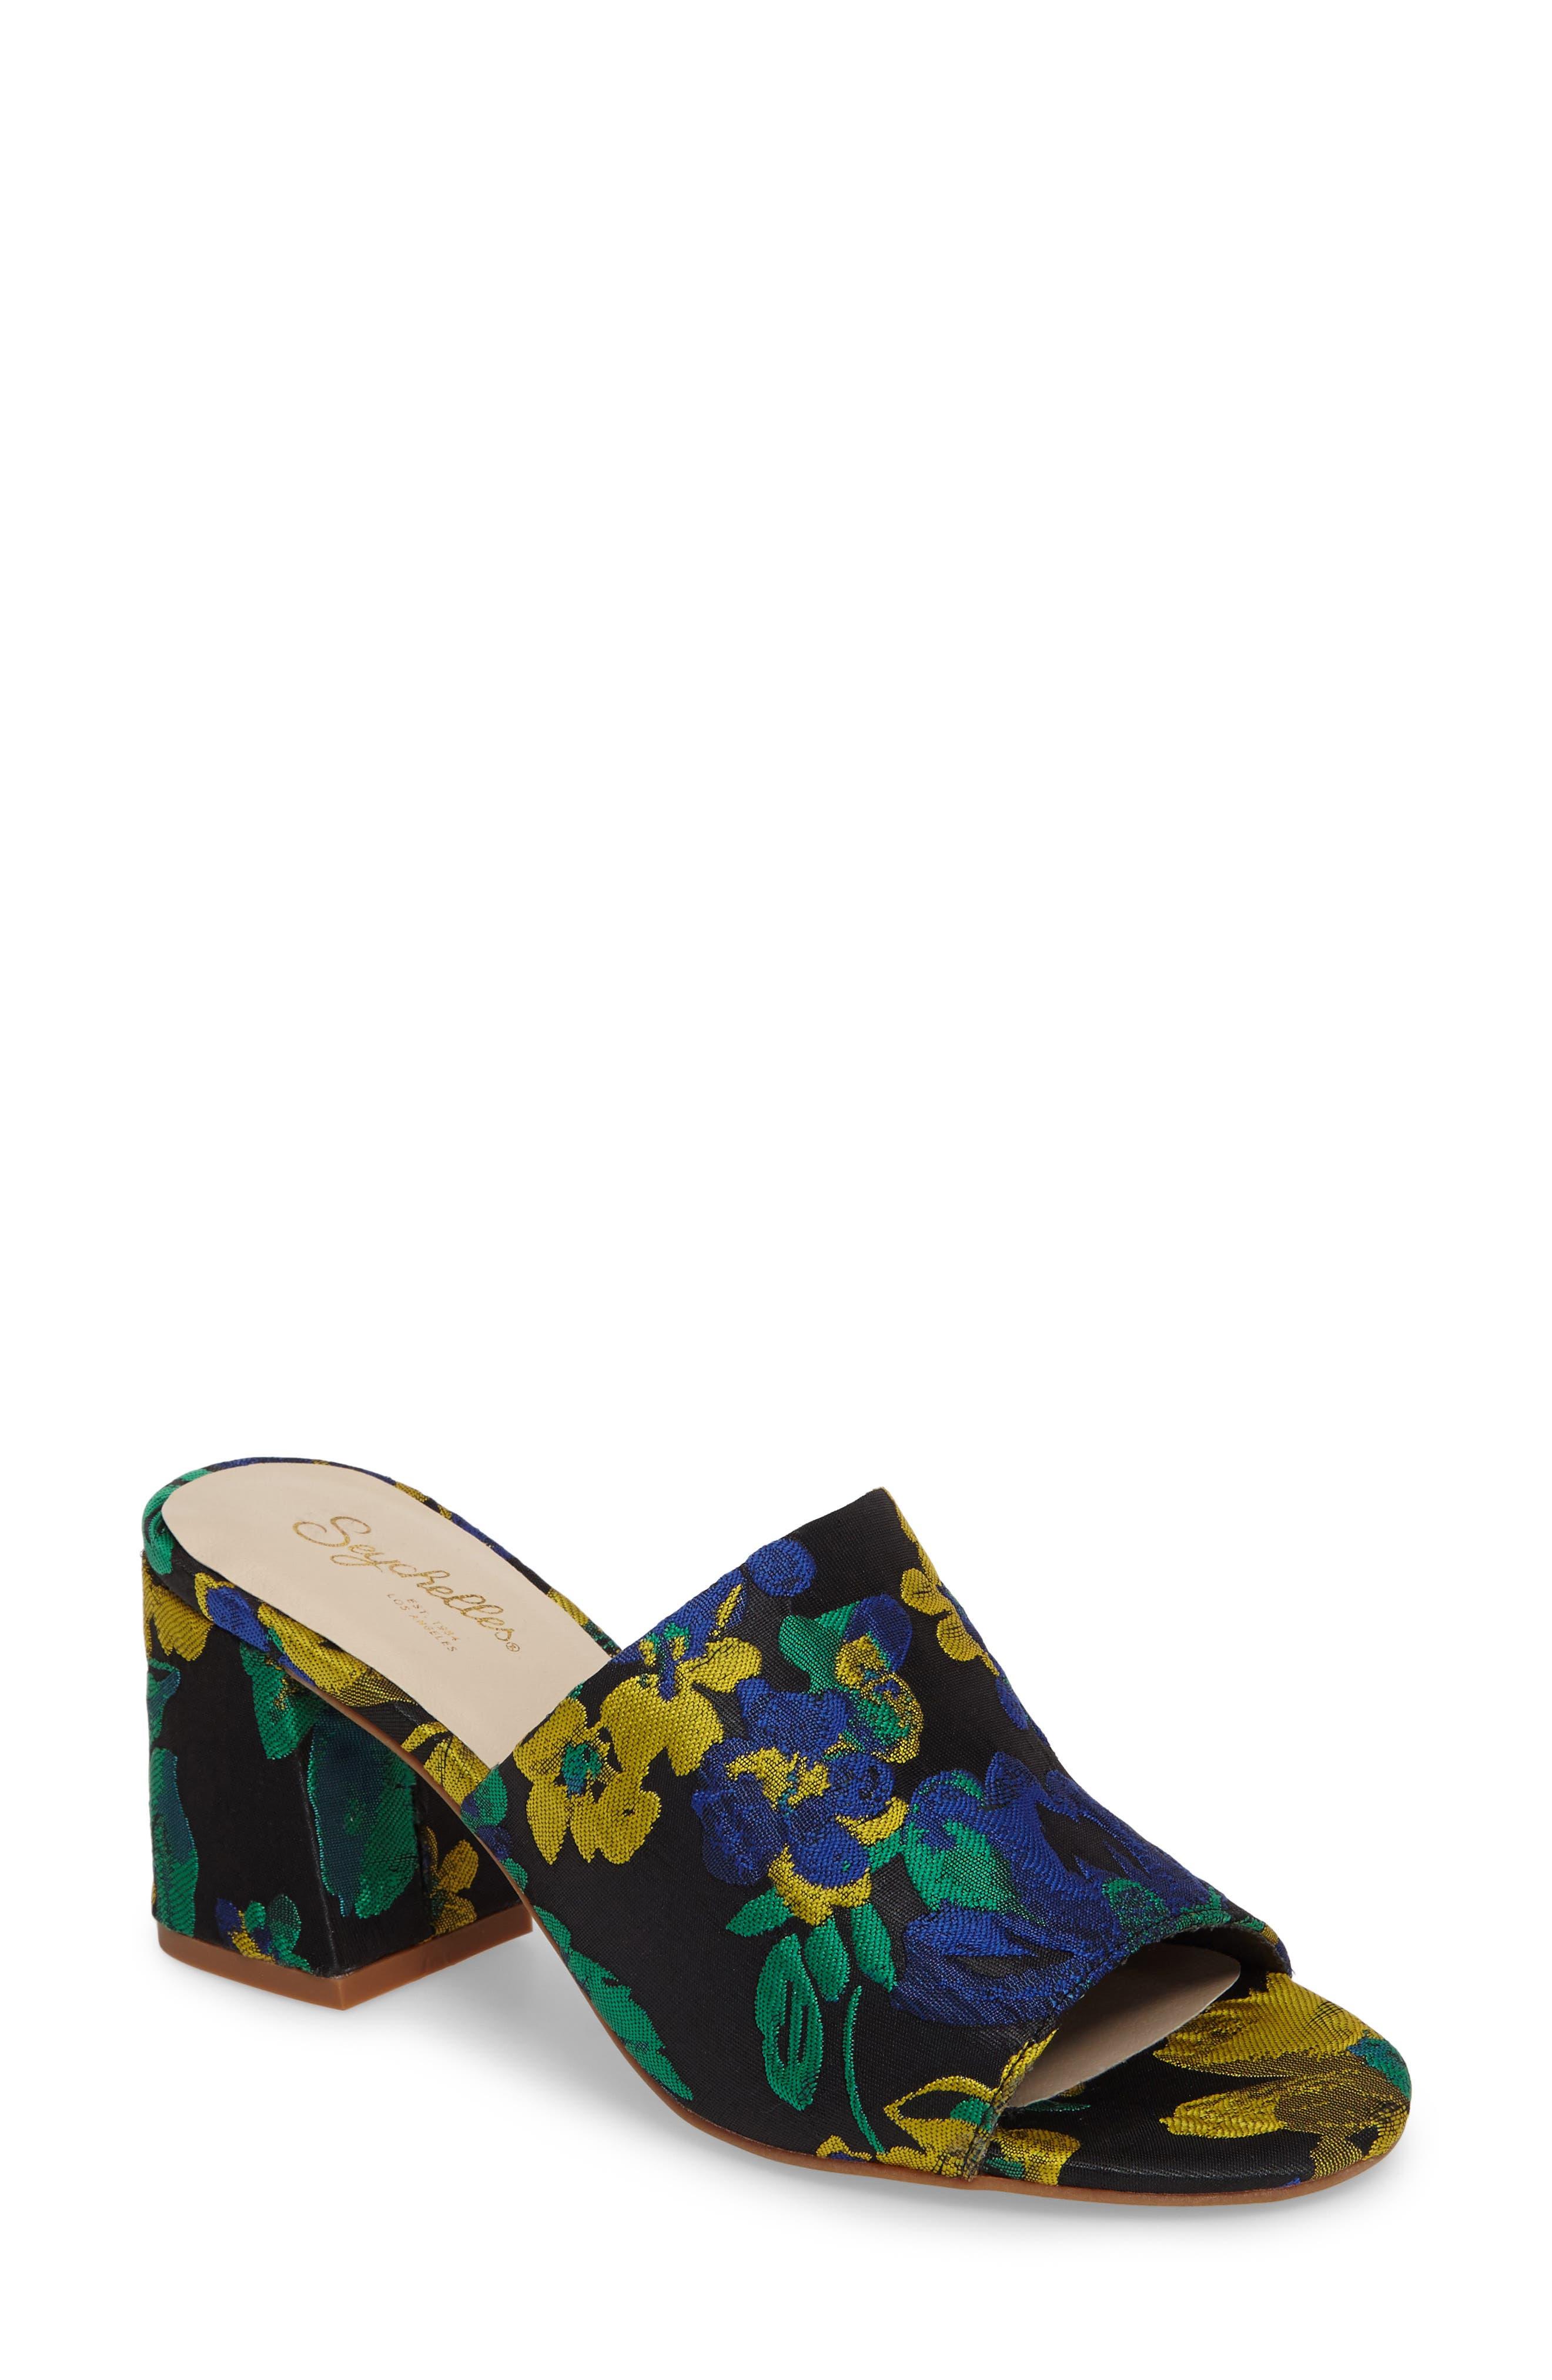 Main Image - Seychelles Commute Floral Flared Heel Sandal (Women)